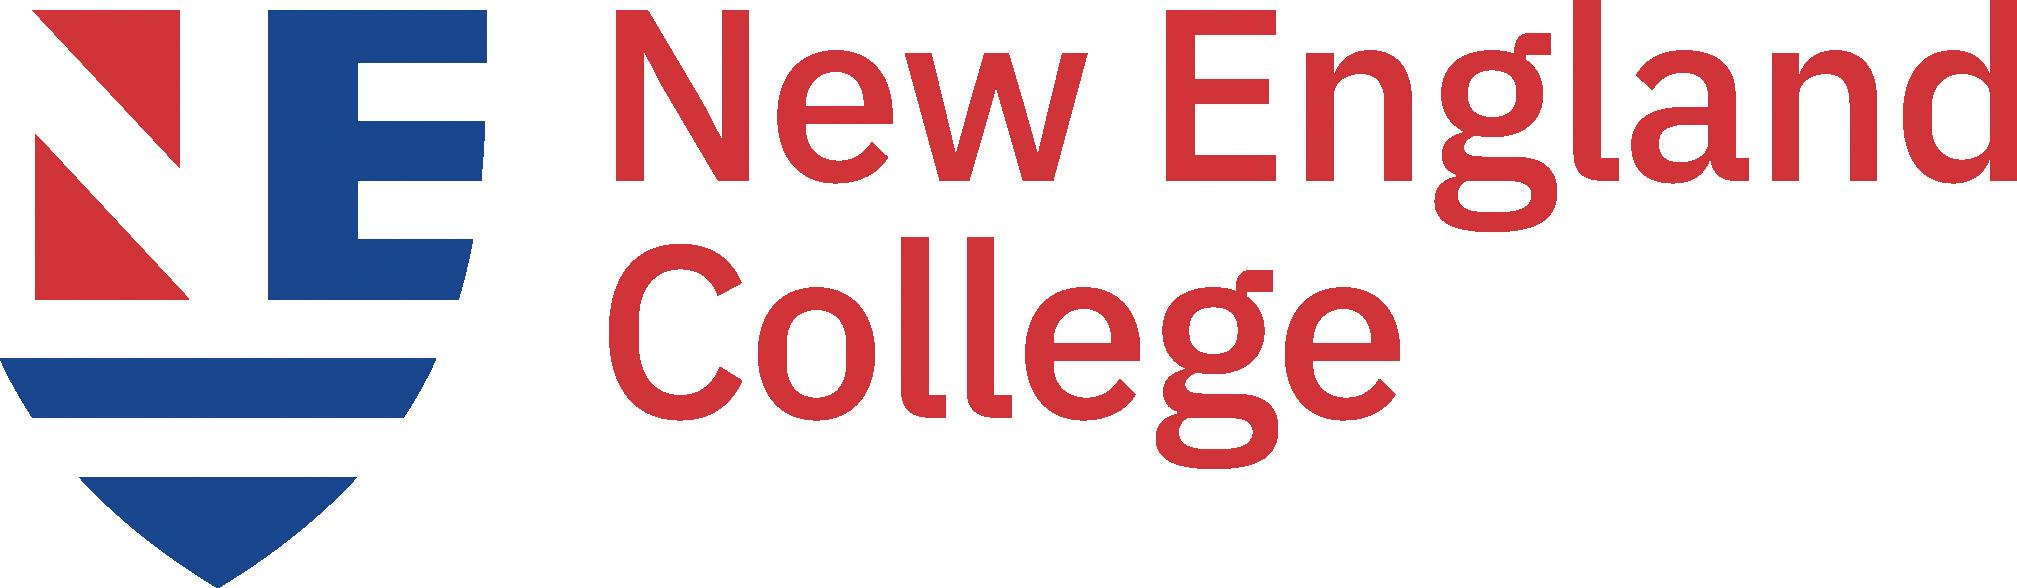 NE College logo